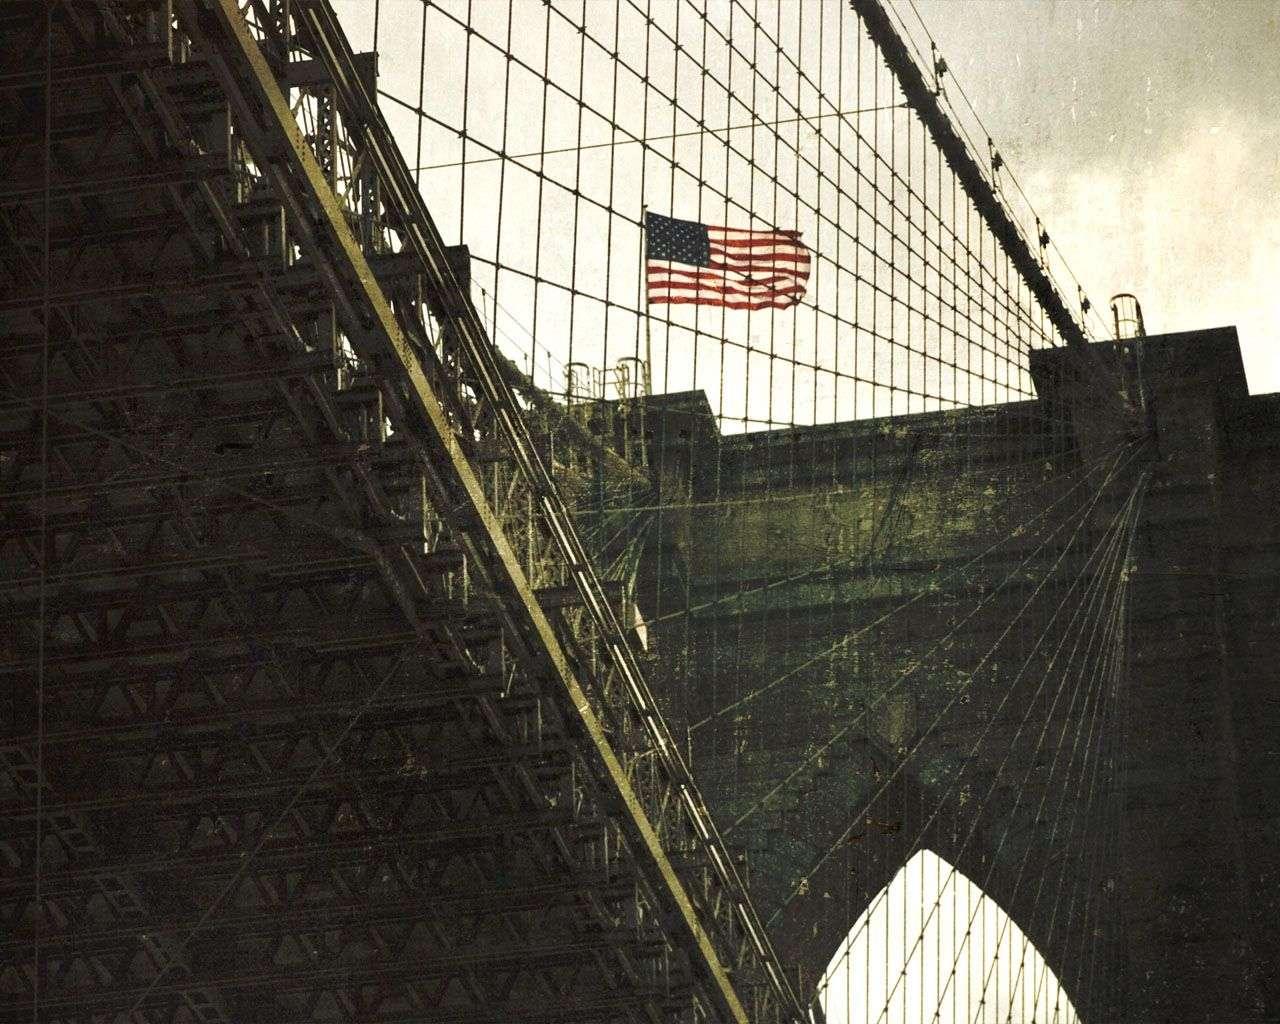 American Flag Wallpaper 008